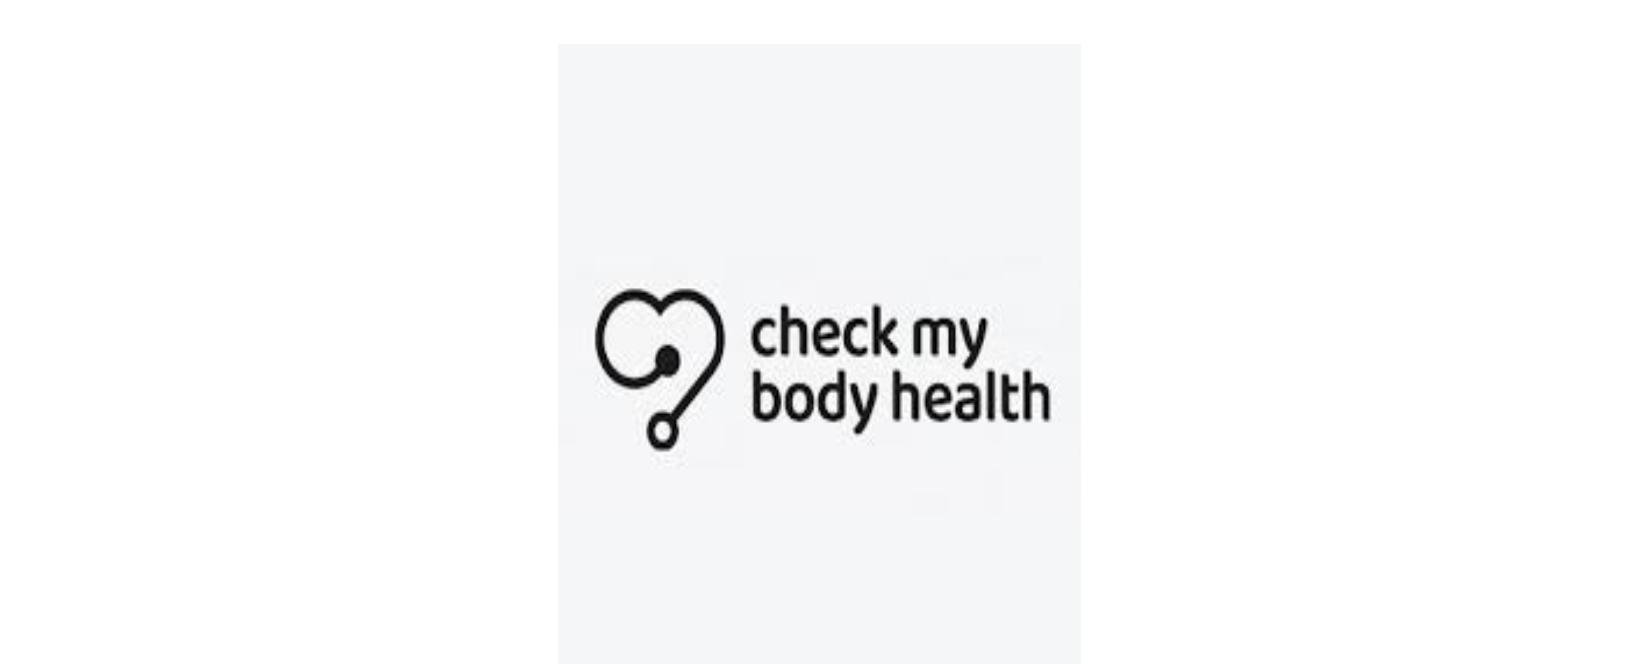 Check My Body Health Discount Code 2021